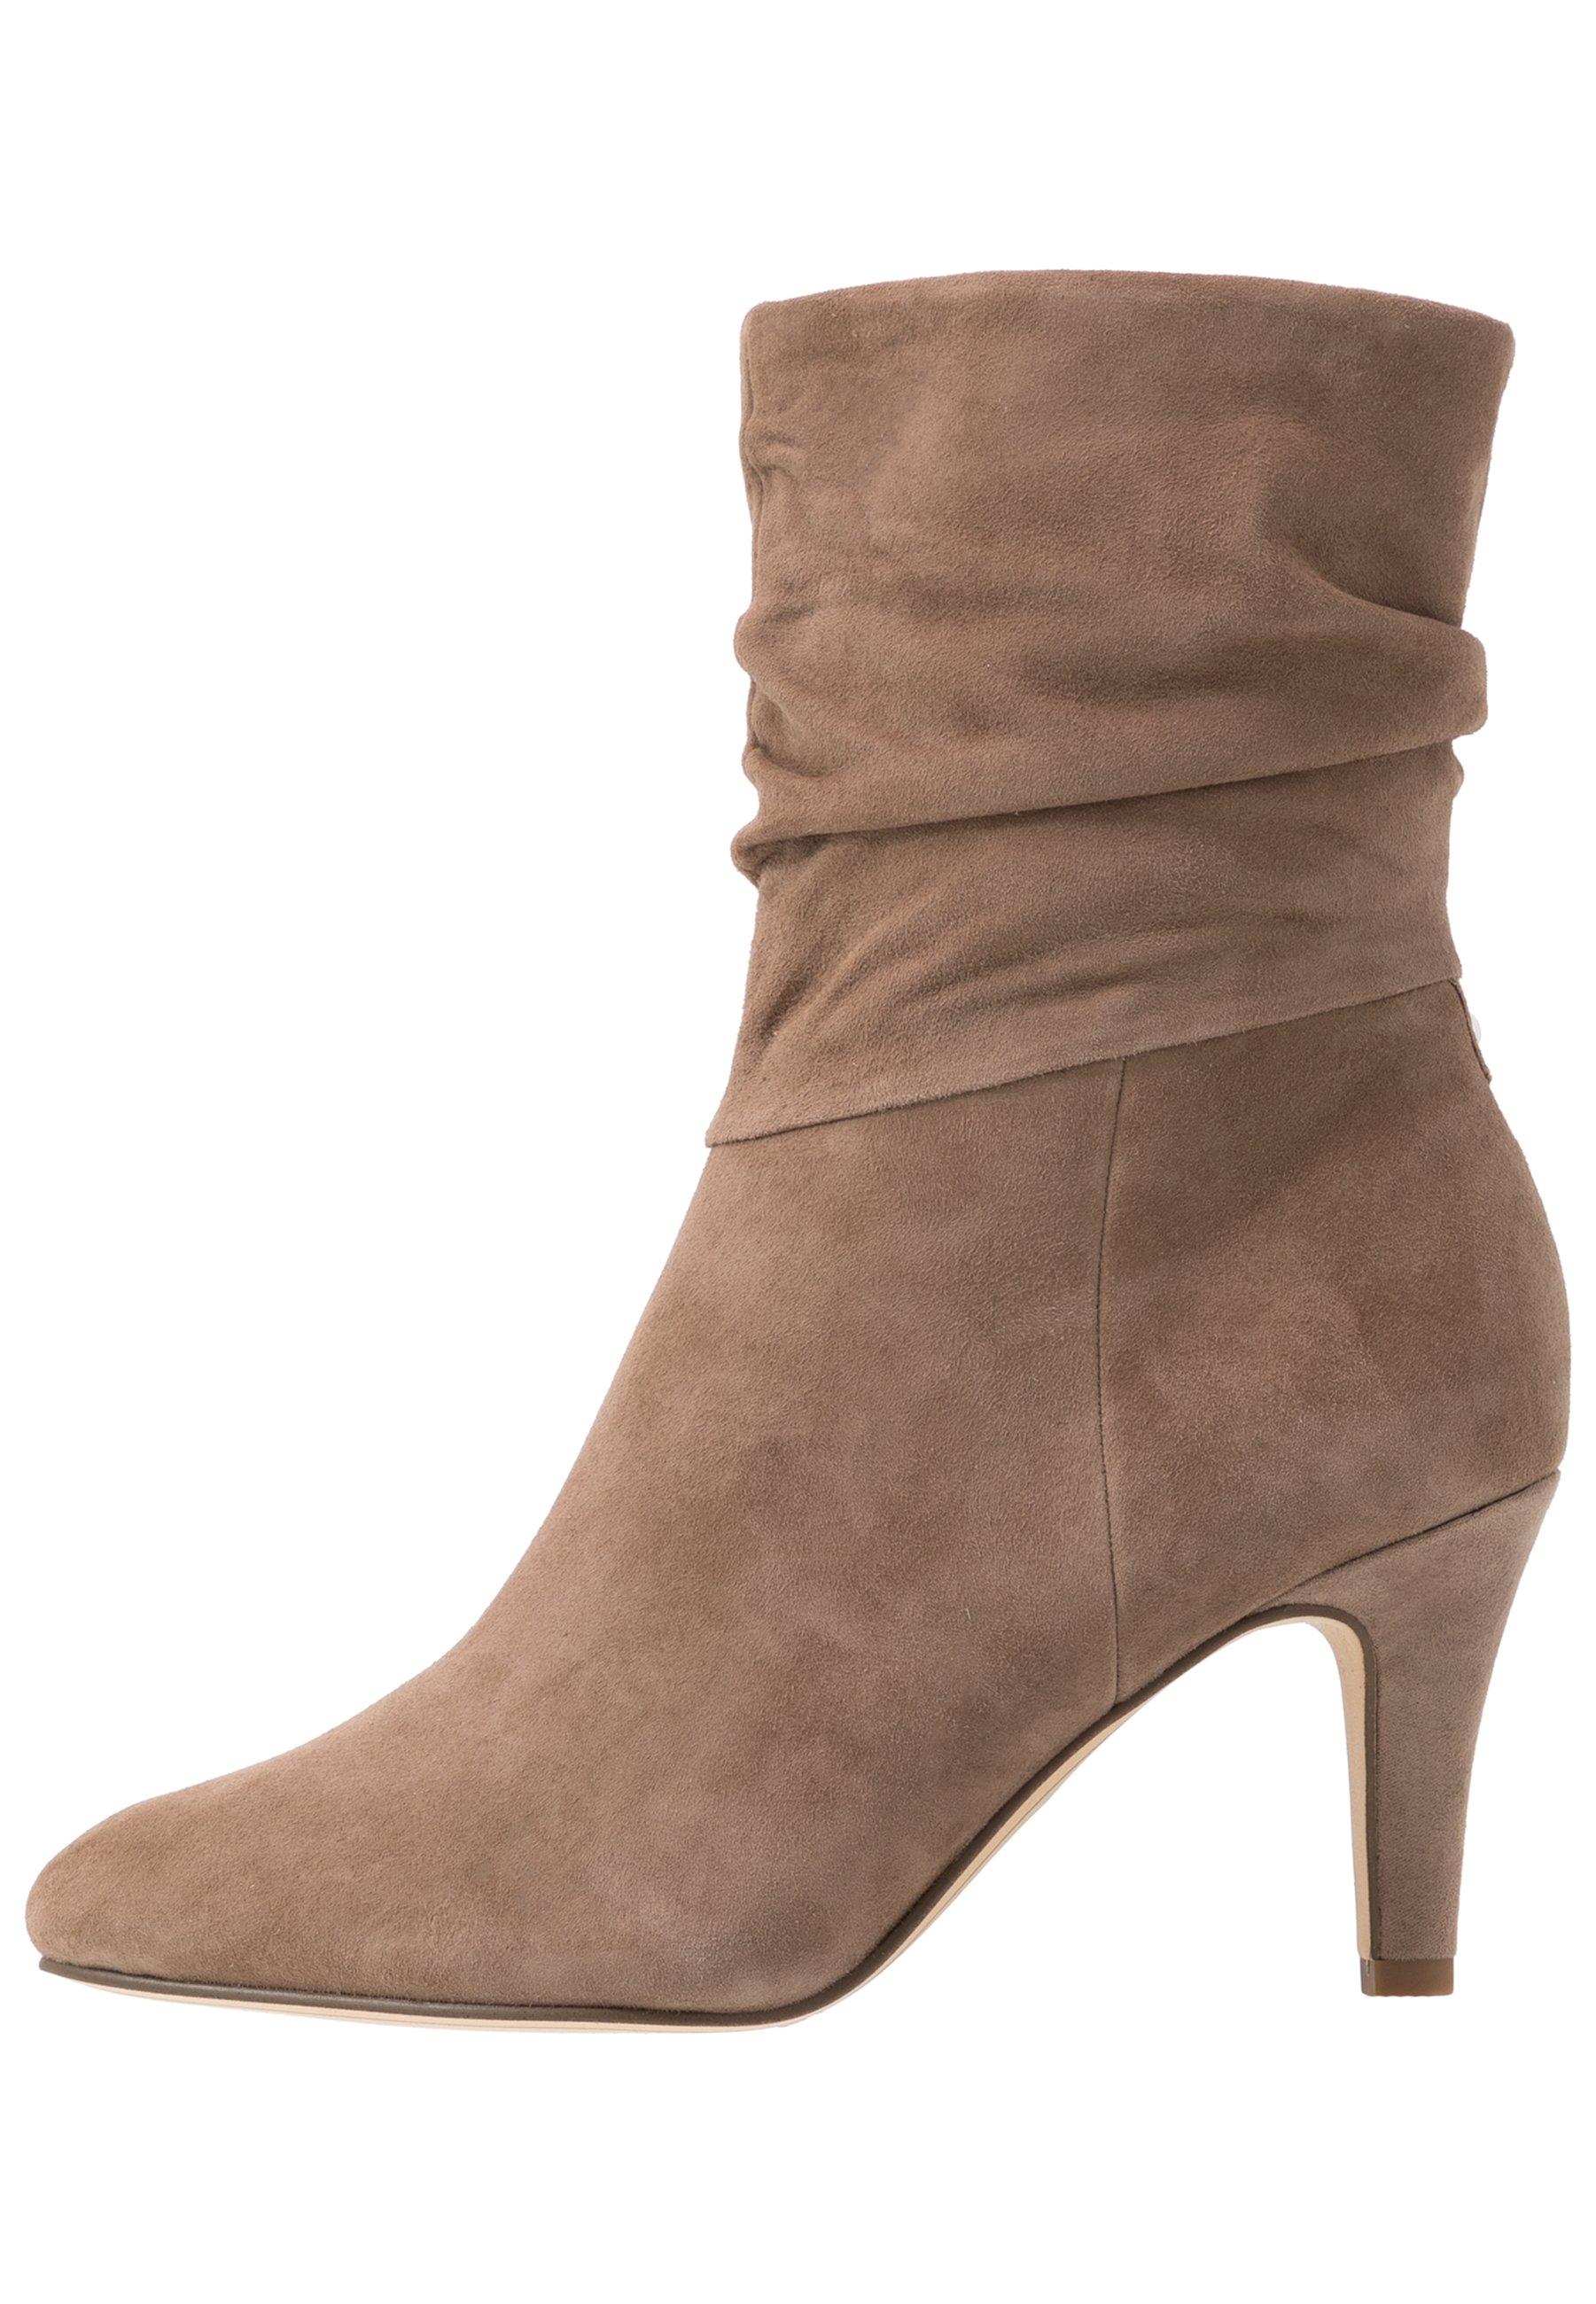 Tamaris Boots - Stiefelette Antelope/beige